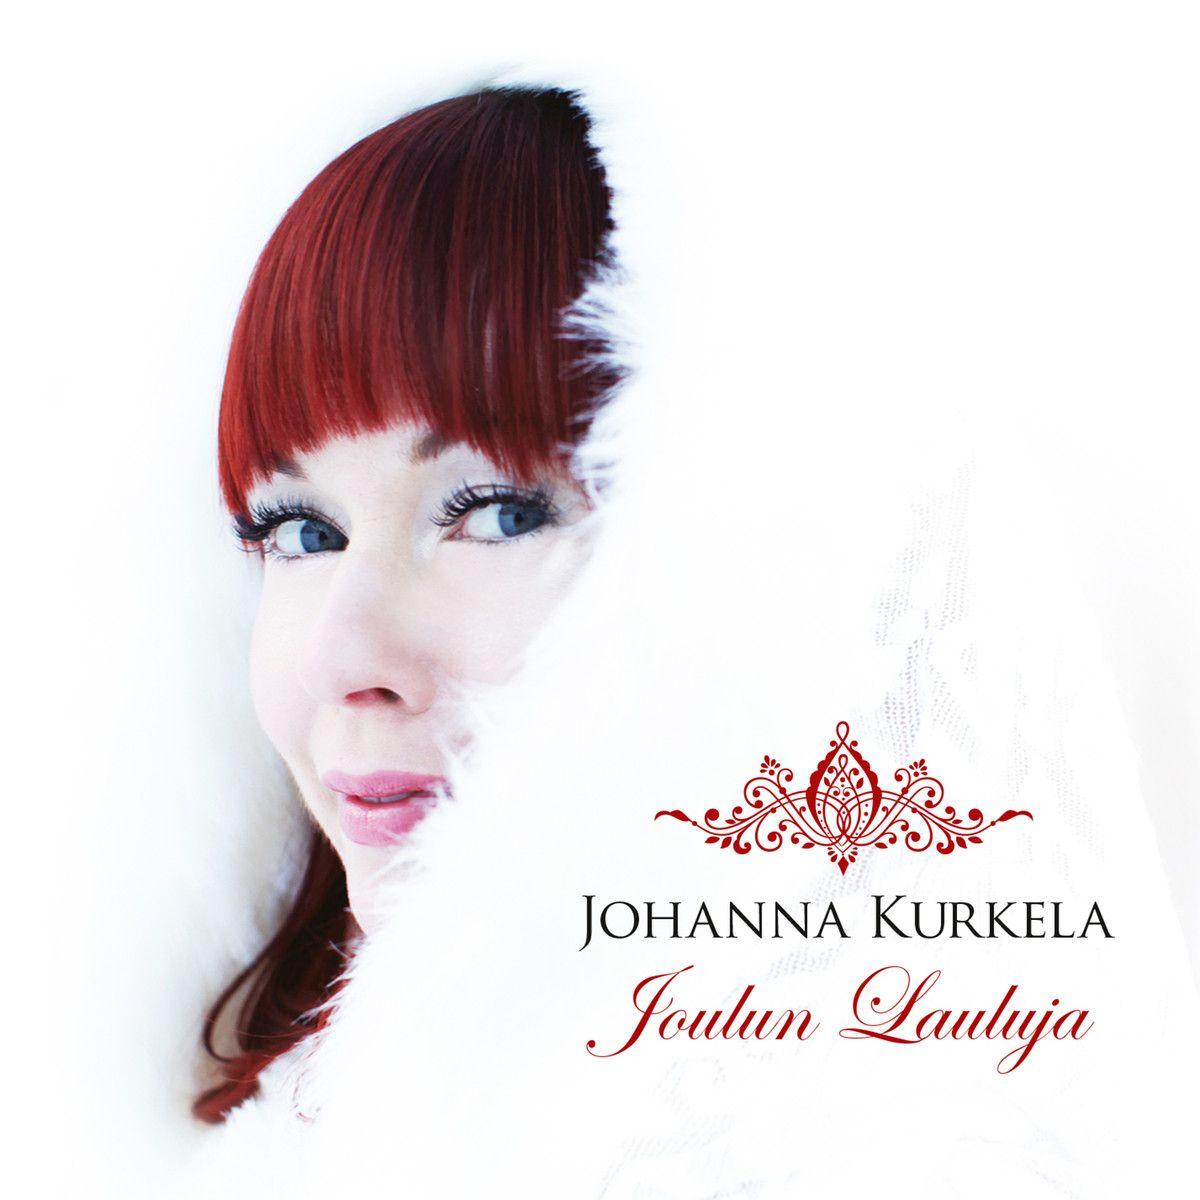 Johanna Kurkela - Joulun Lauluja album cover